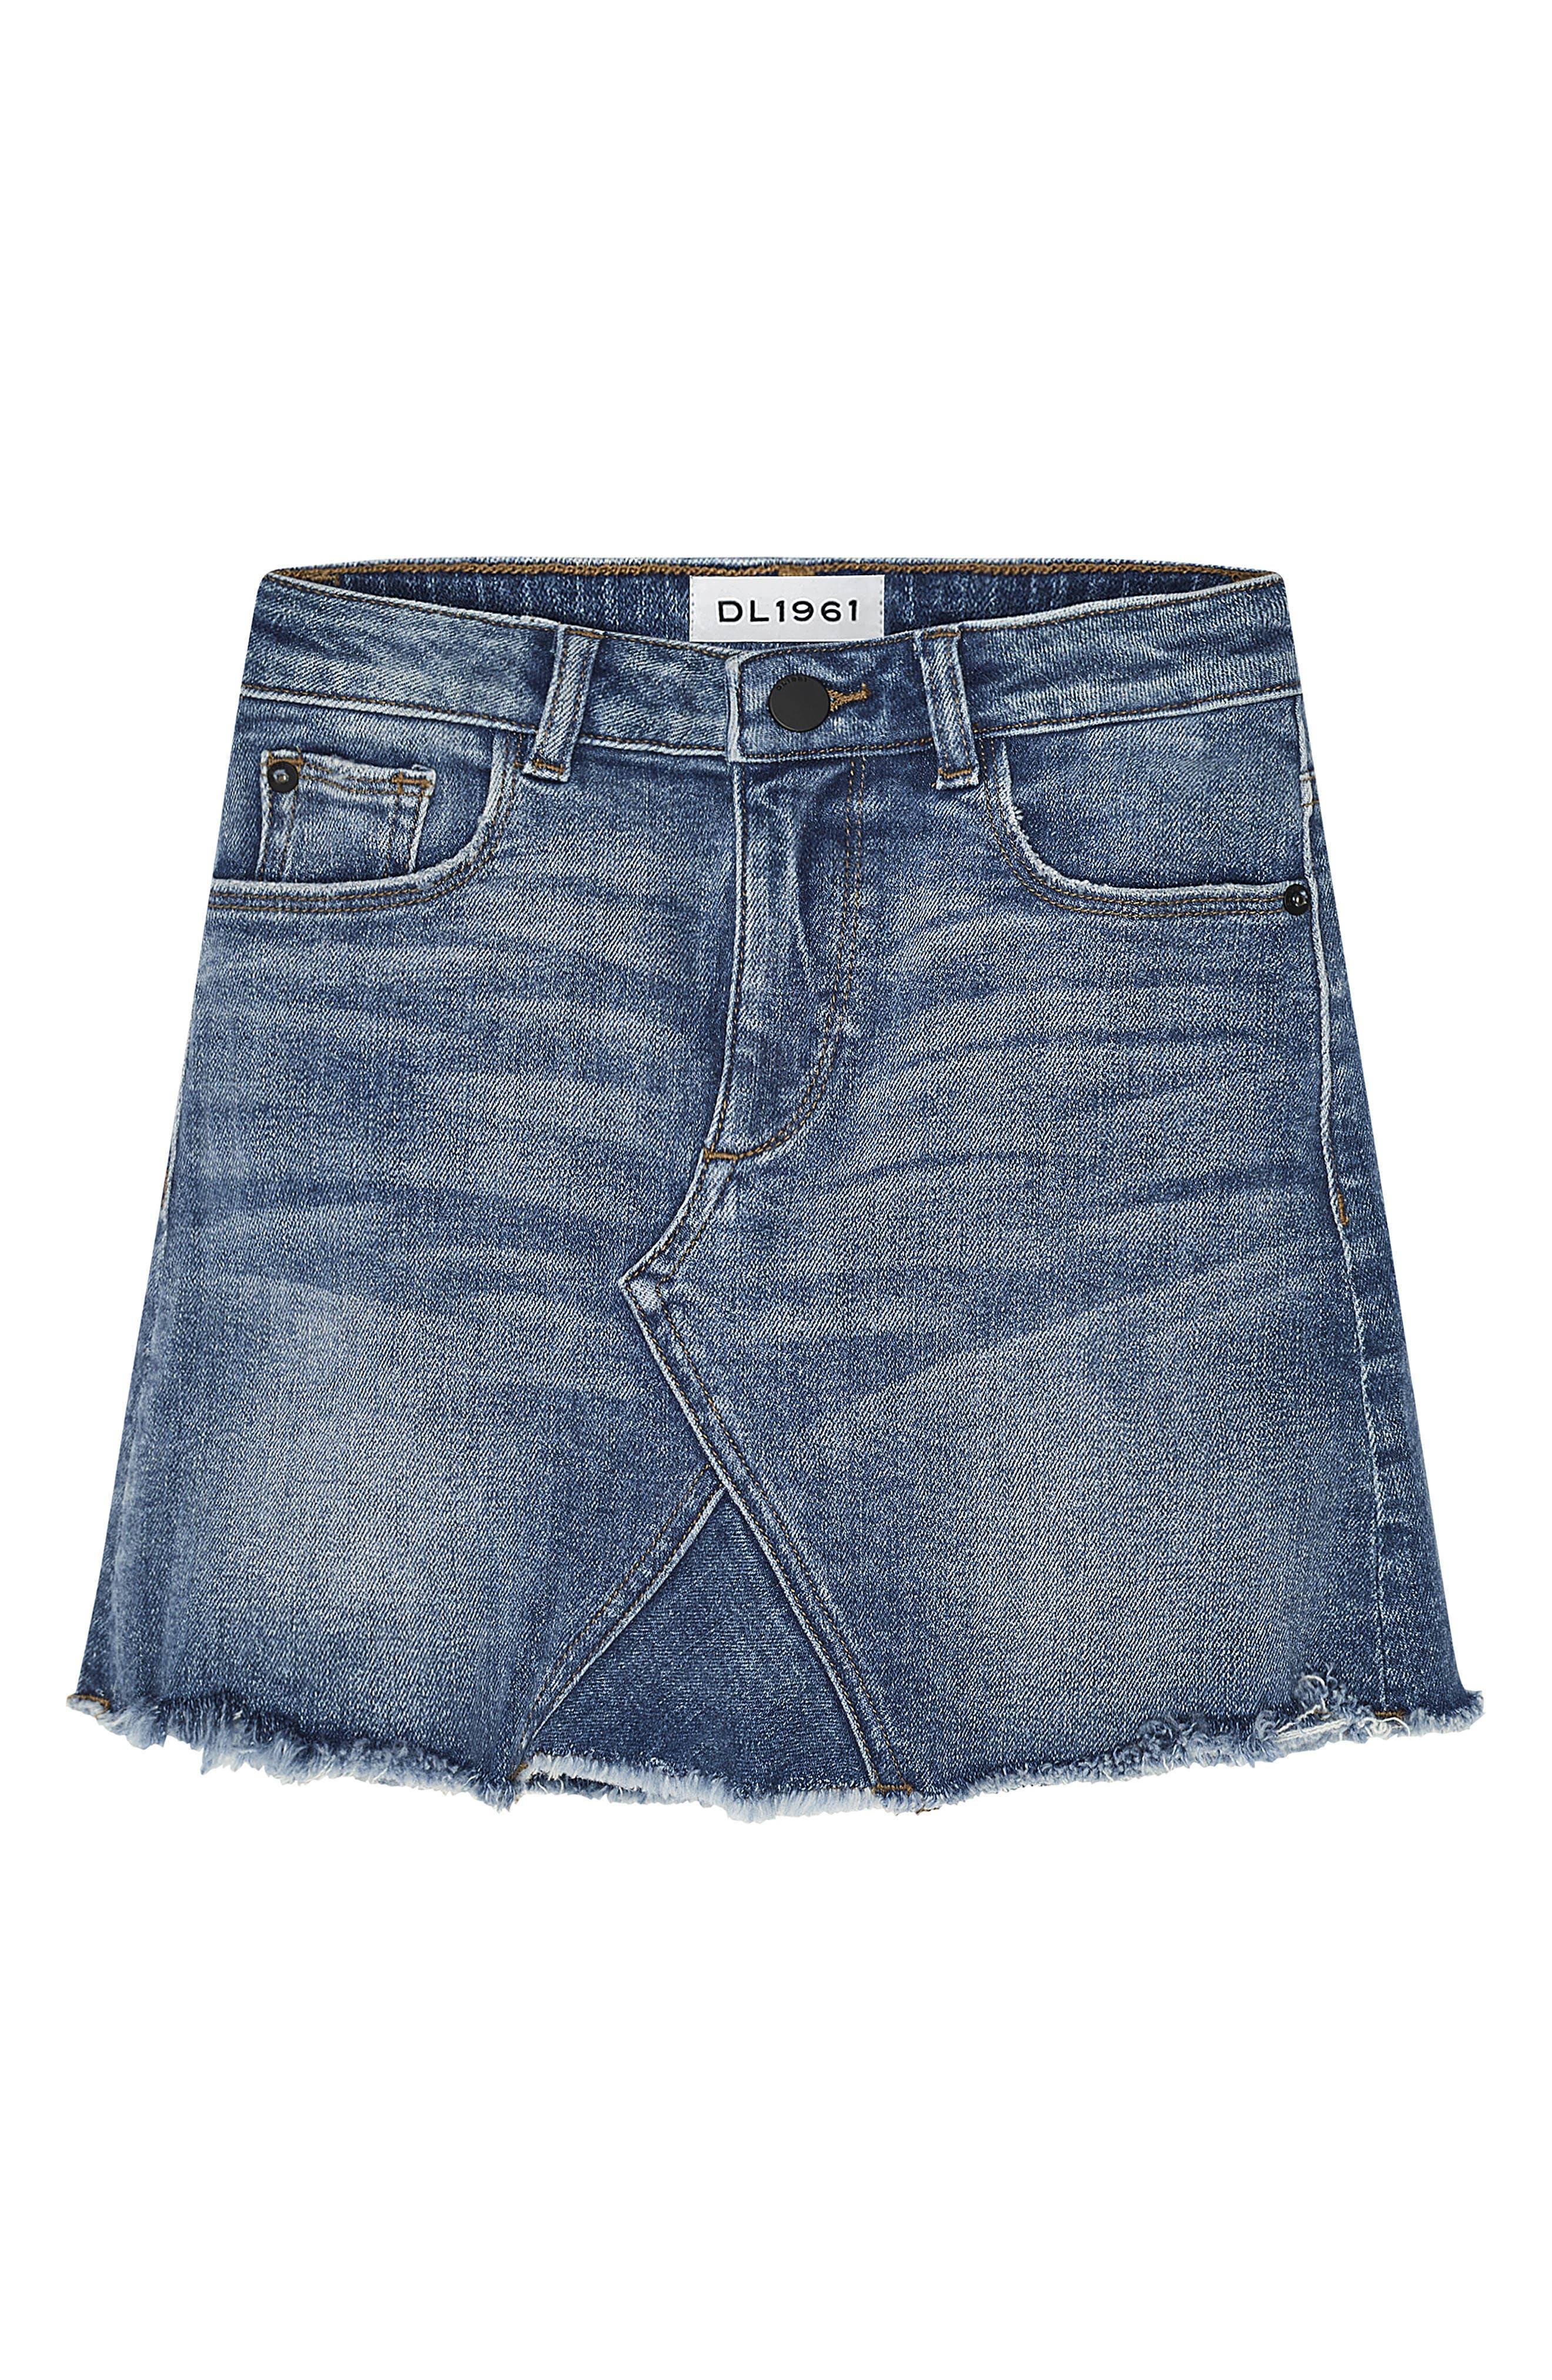 Girls Dl1961 Denim Miniskirt Size 12  Blue